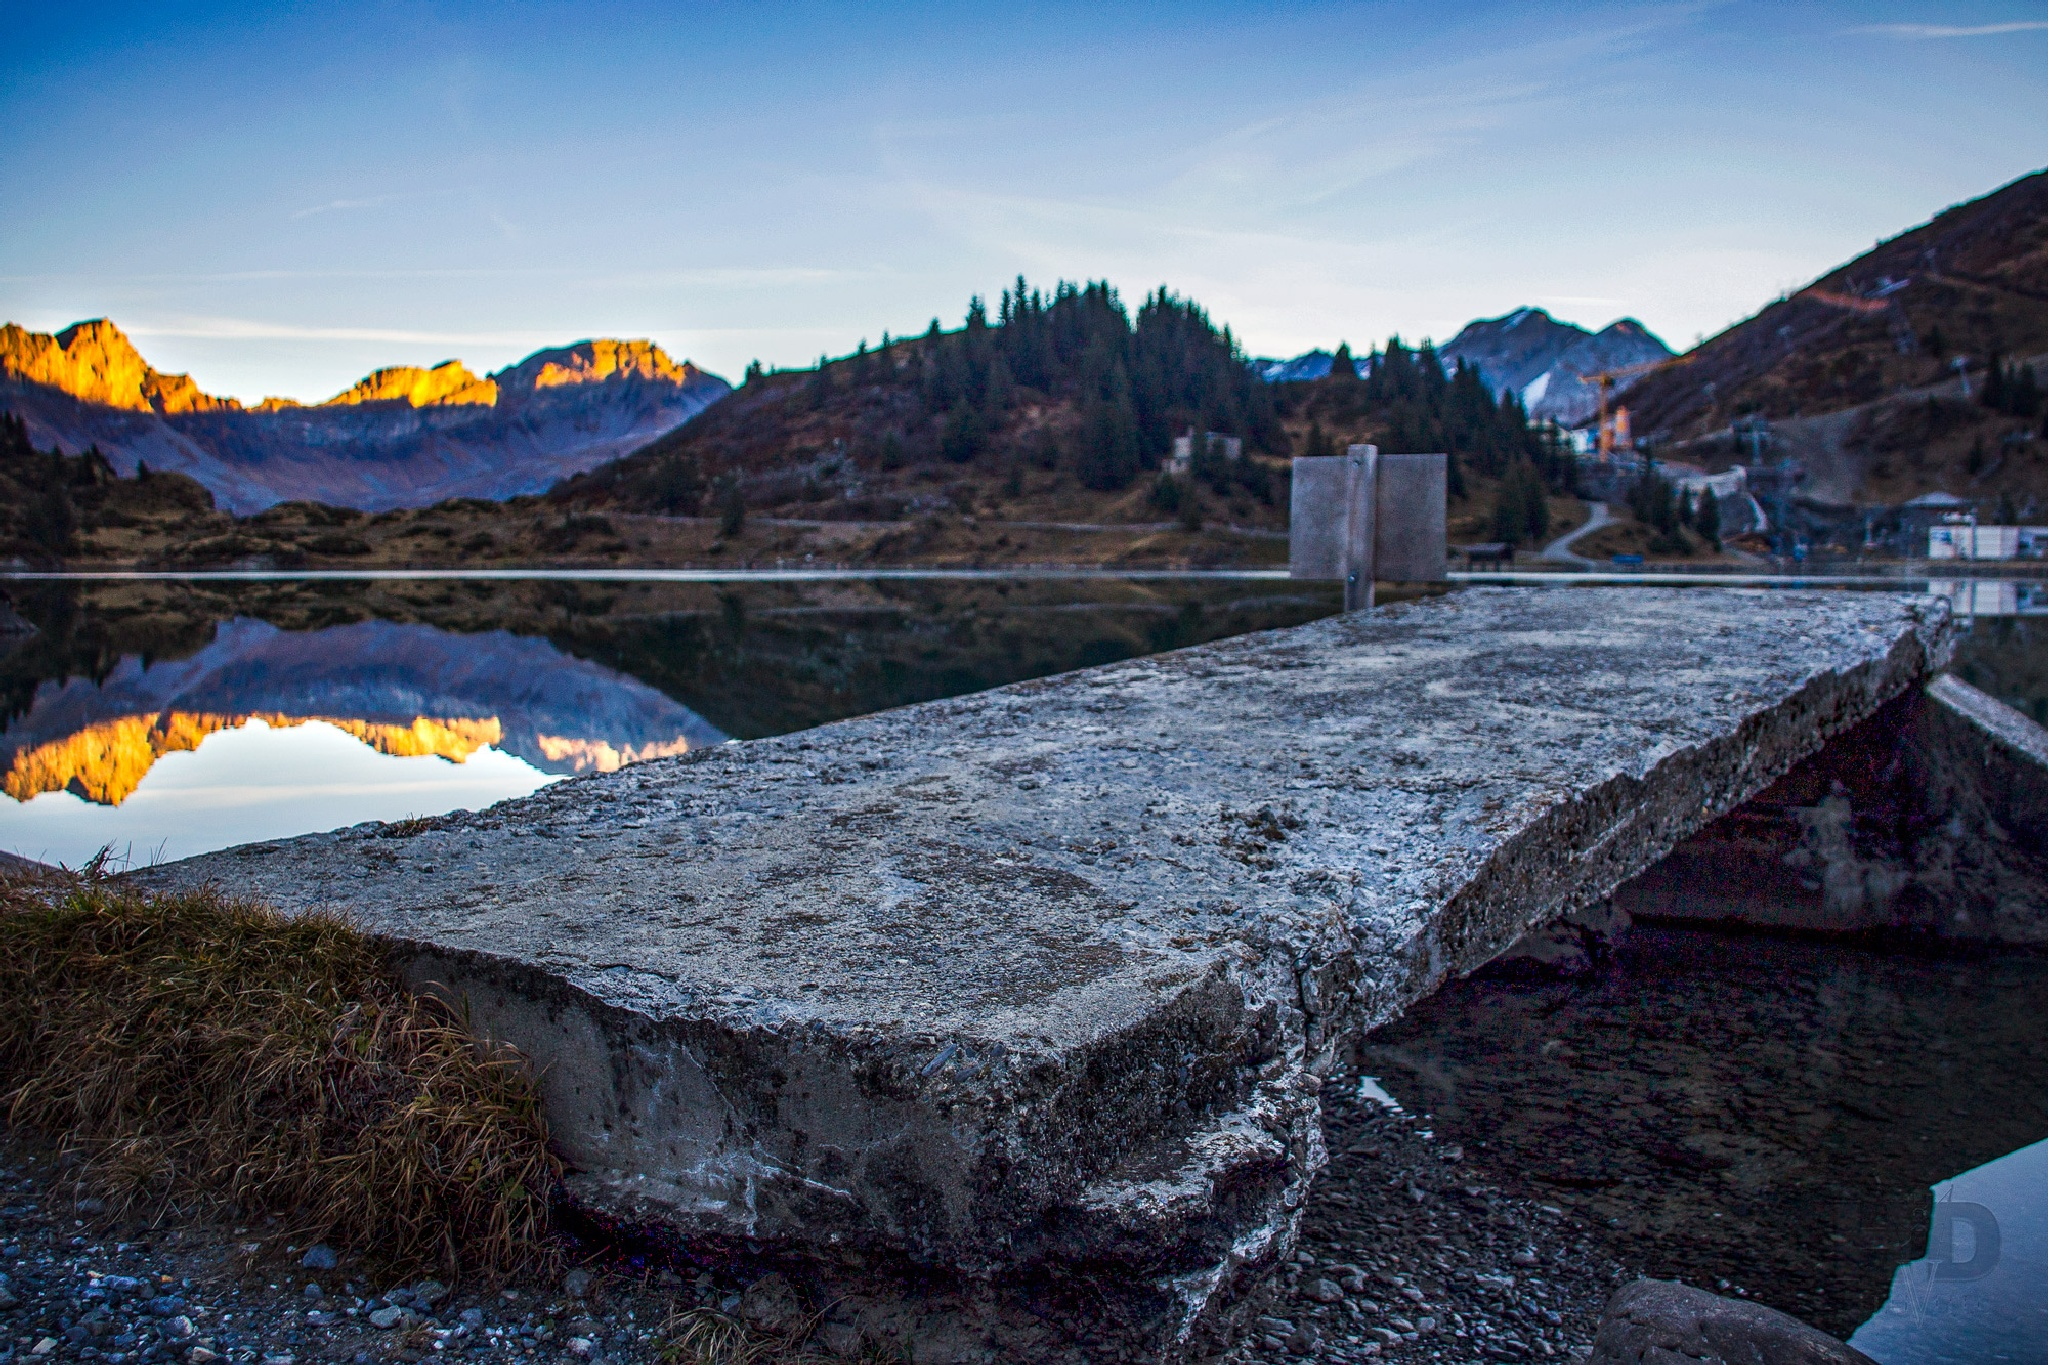 Projekt Enstlensee by dhabluetzel